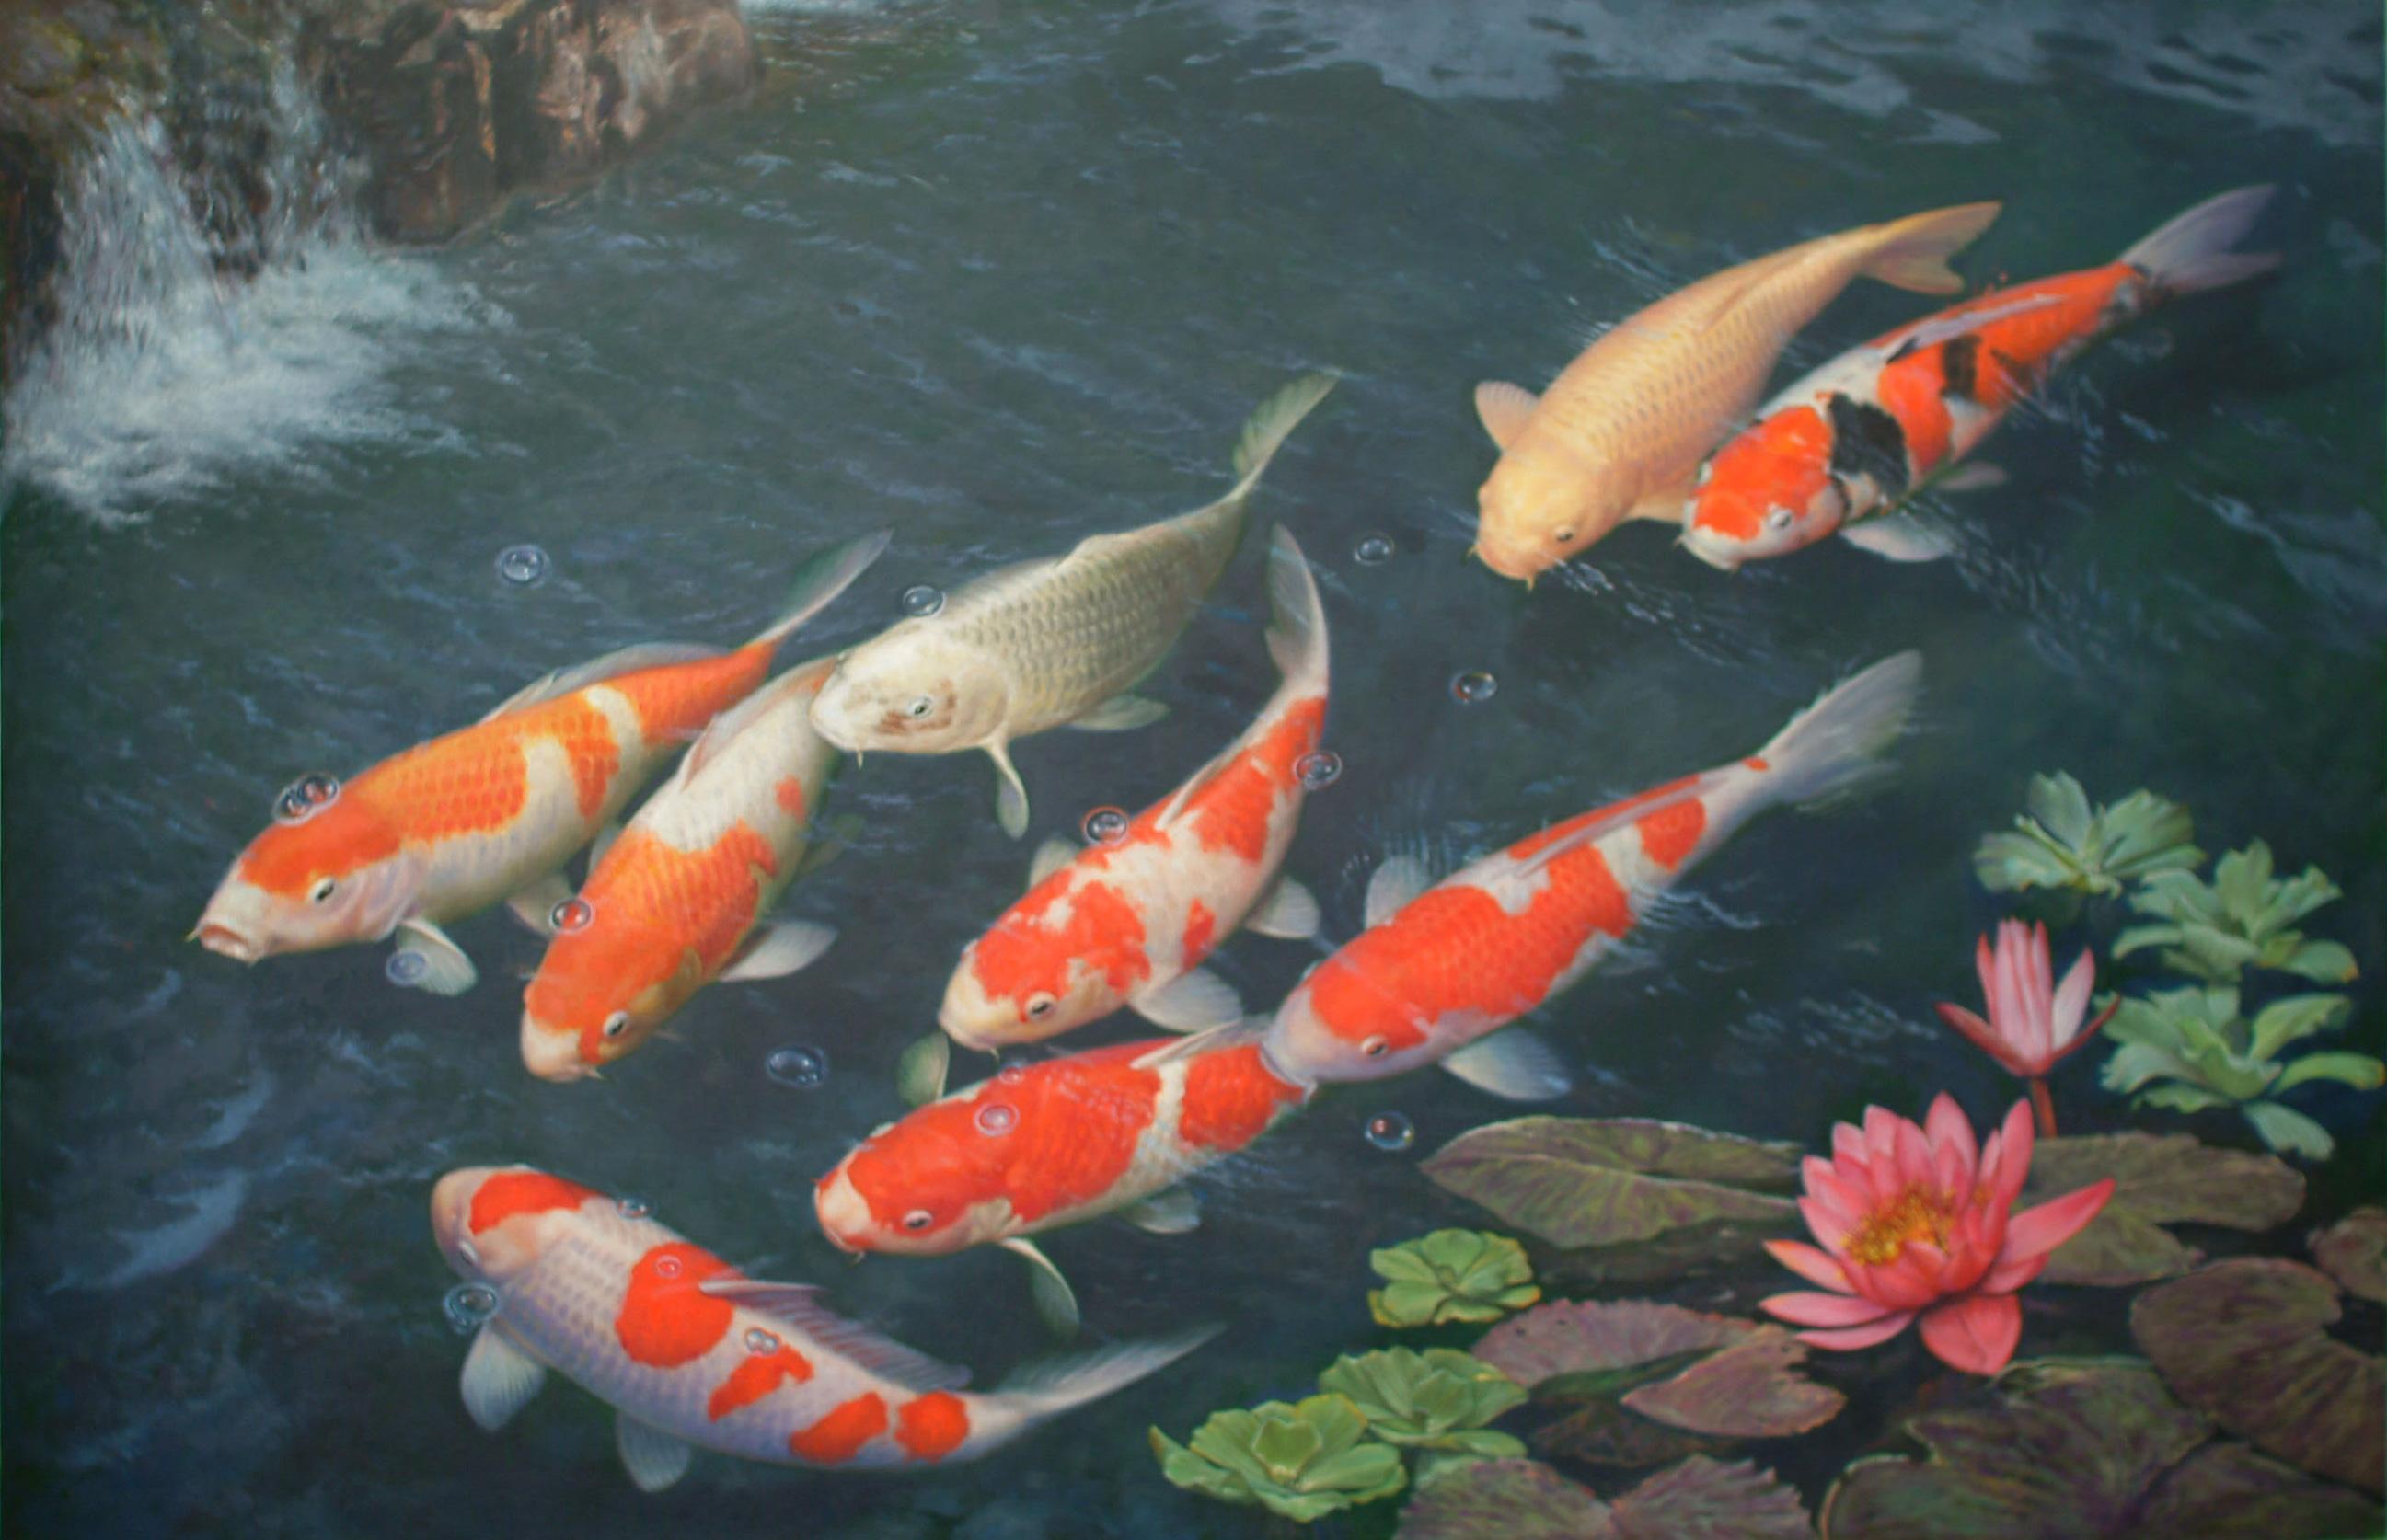 koi fish wallpaper for walls koi fish wallpaper free download koi fish